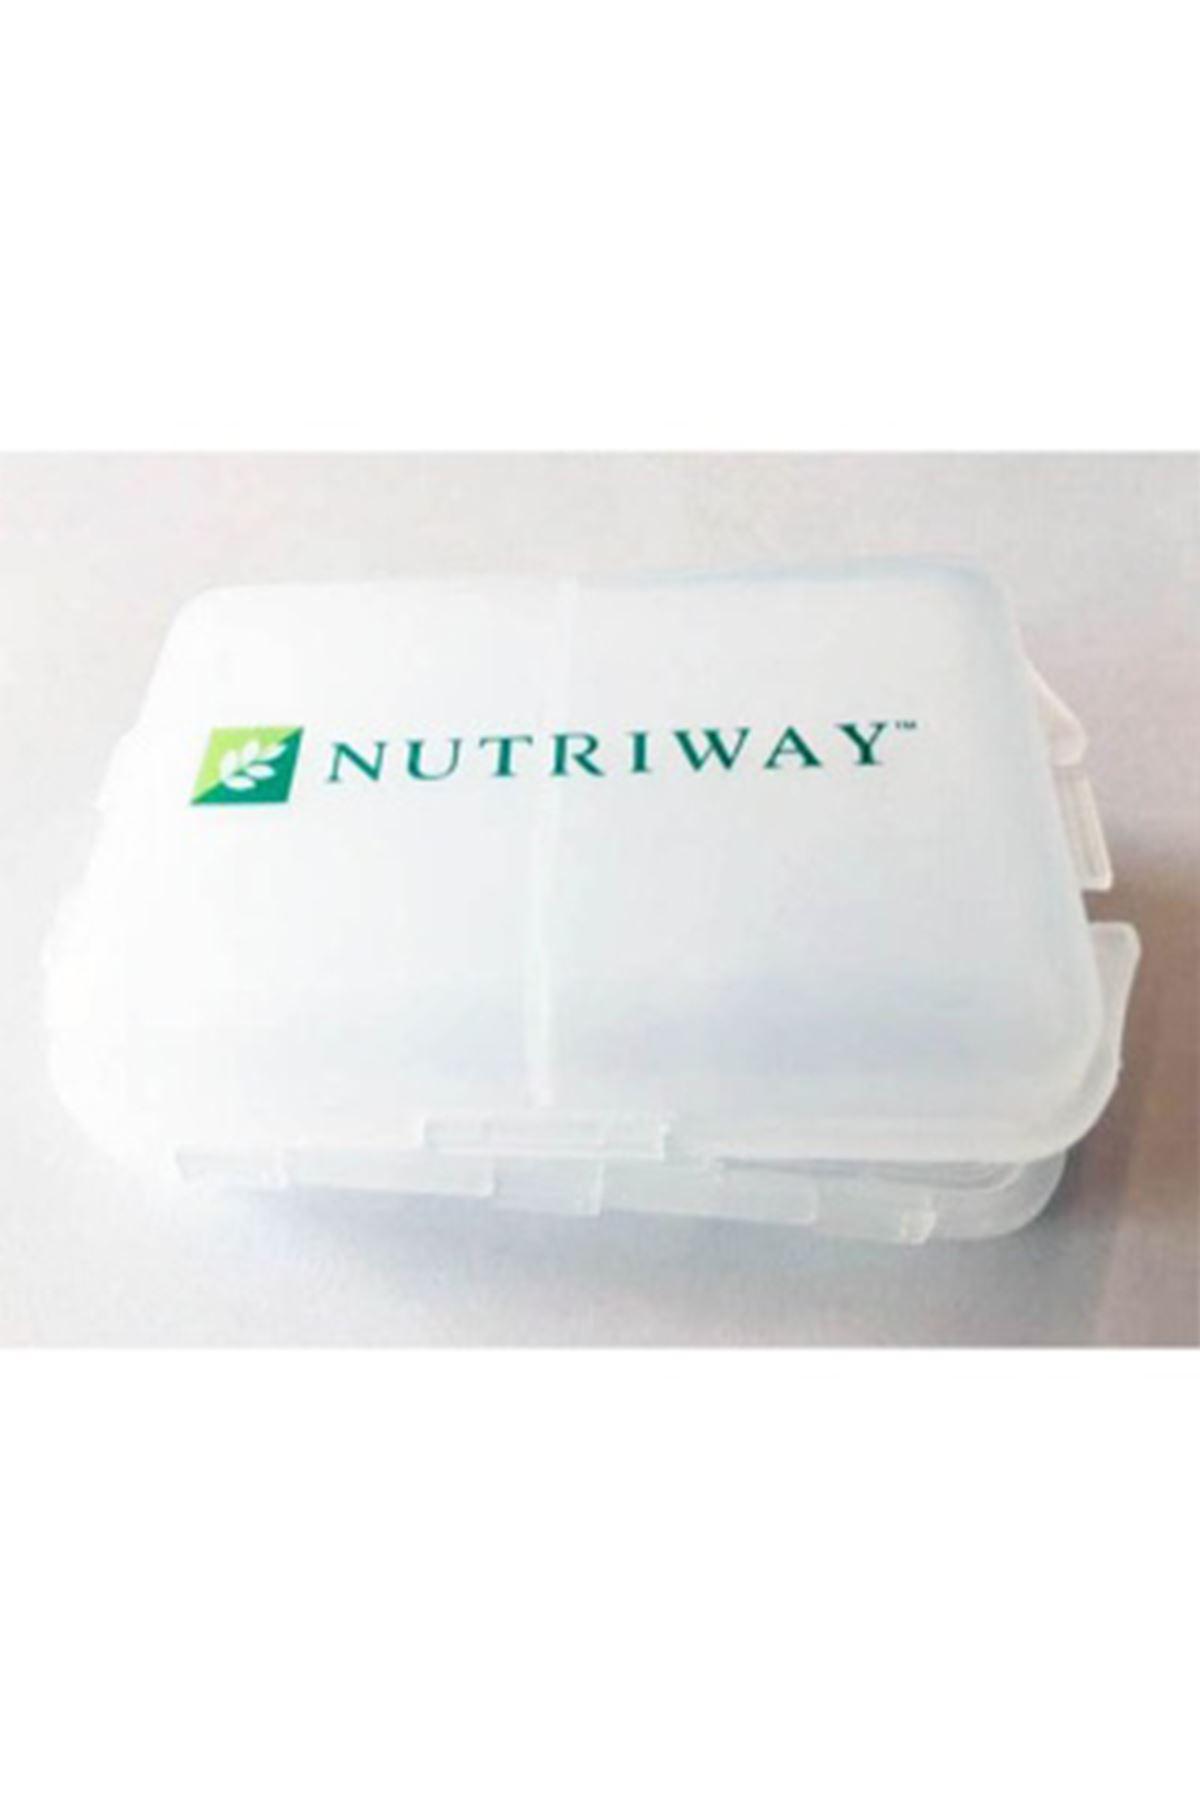 Nutriway Kutusu - NUTRIWAY™